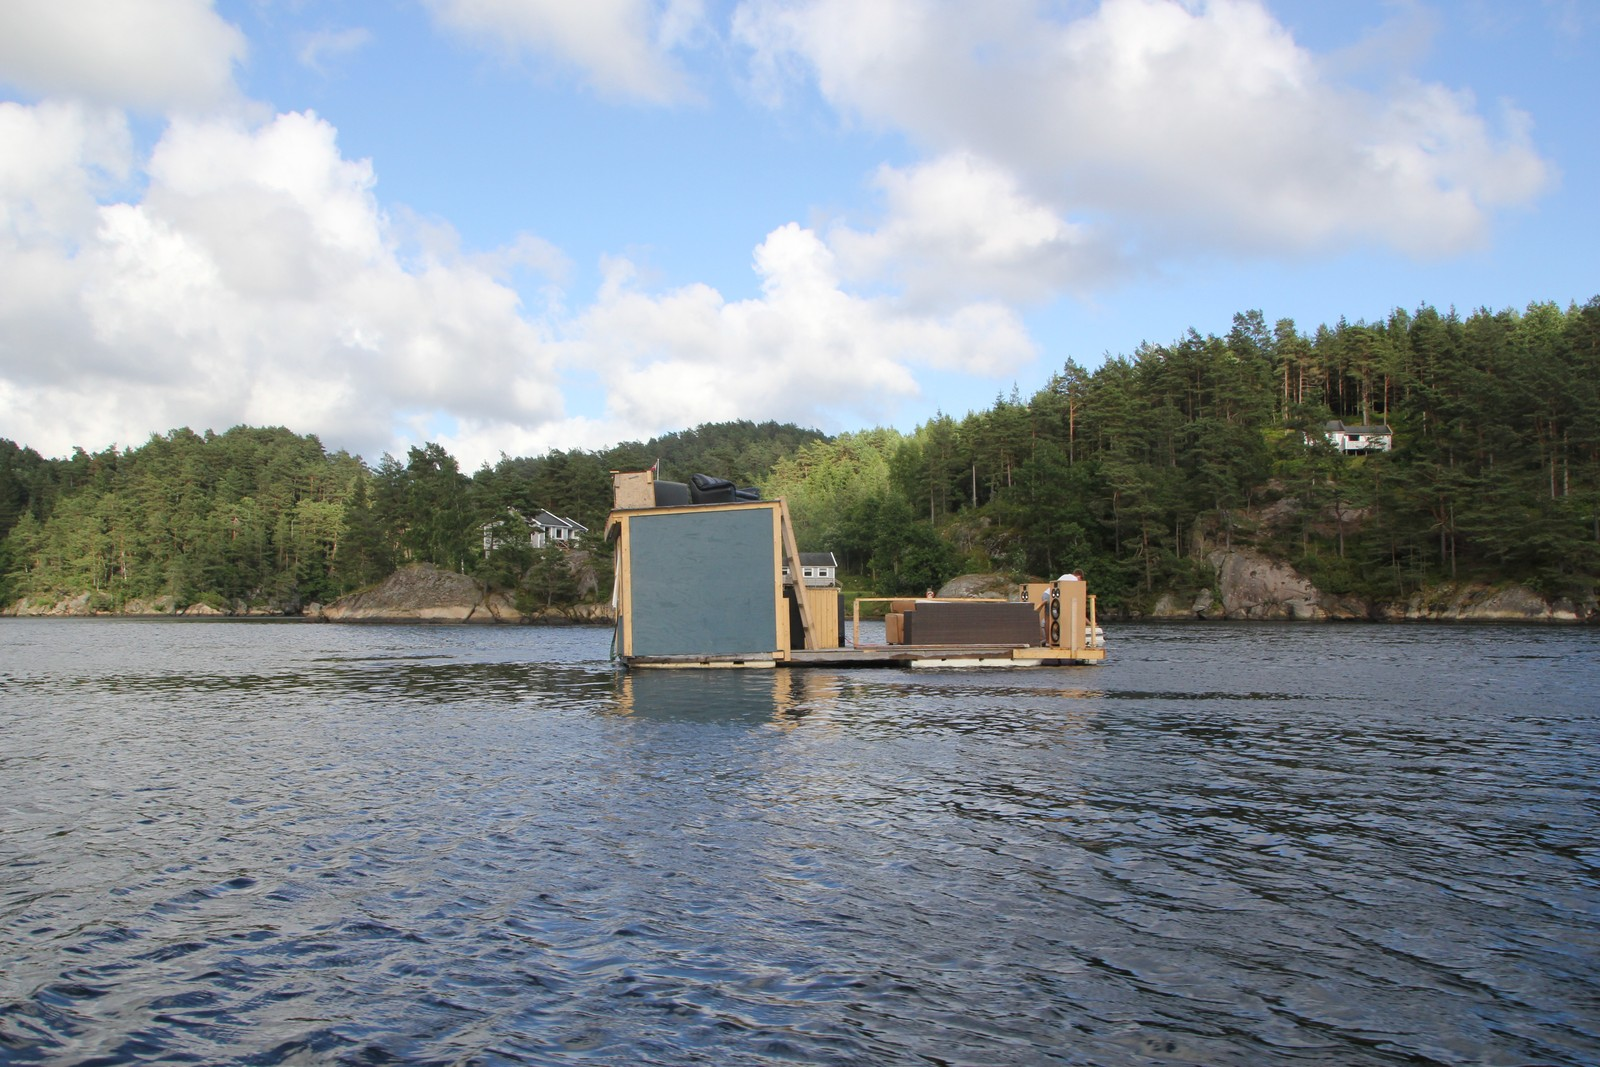 Ligger lavt i vannet i Tånevik i Søgne.